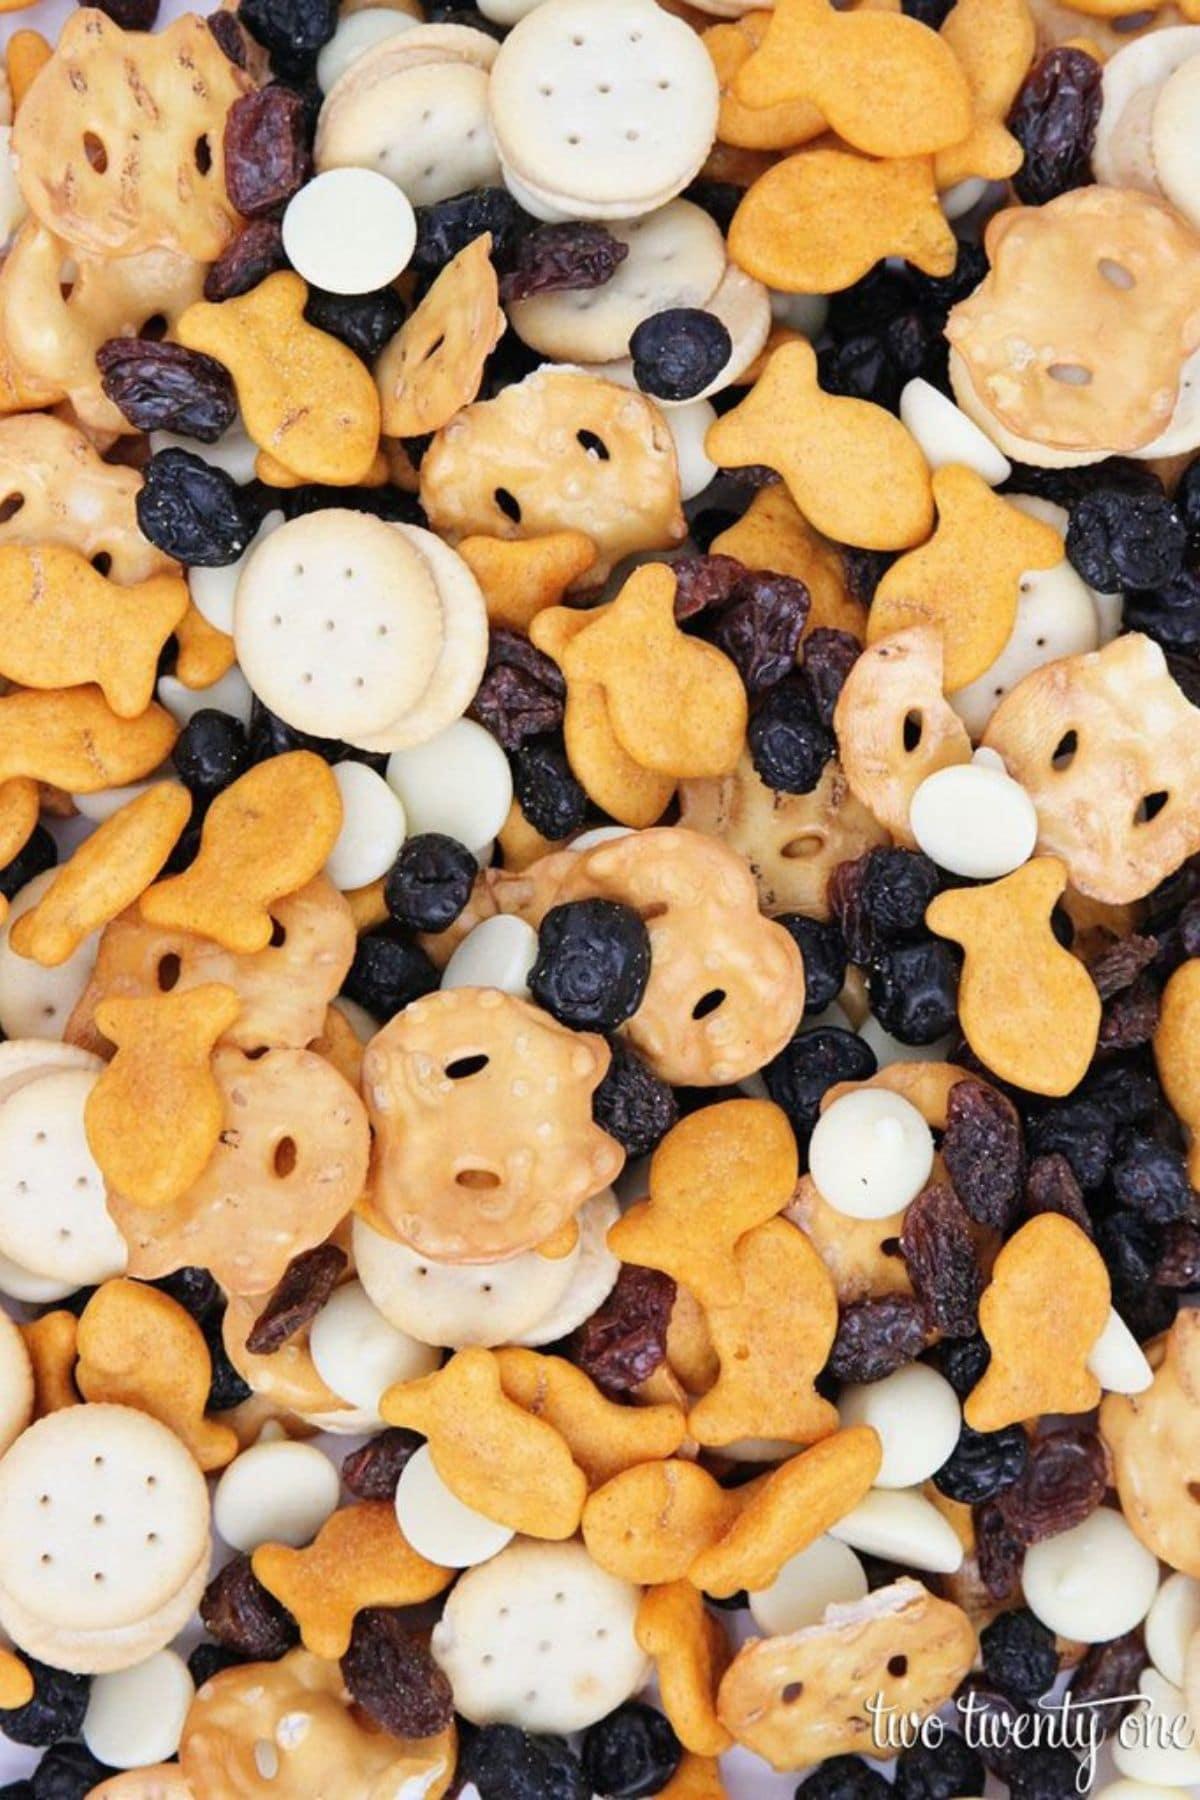 Snack mix with pretzels raisins and goldfish